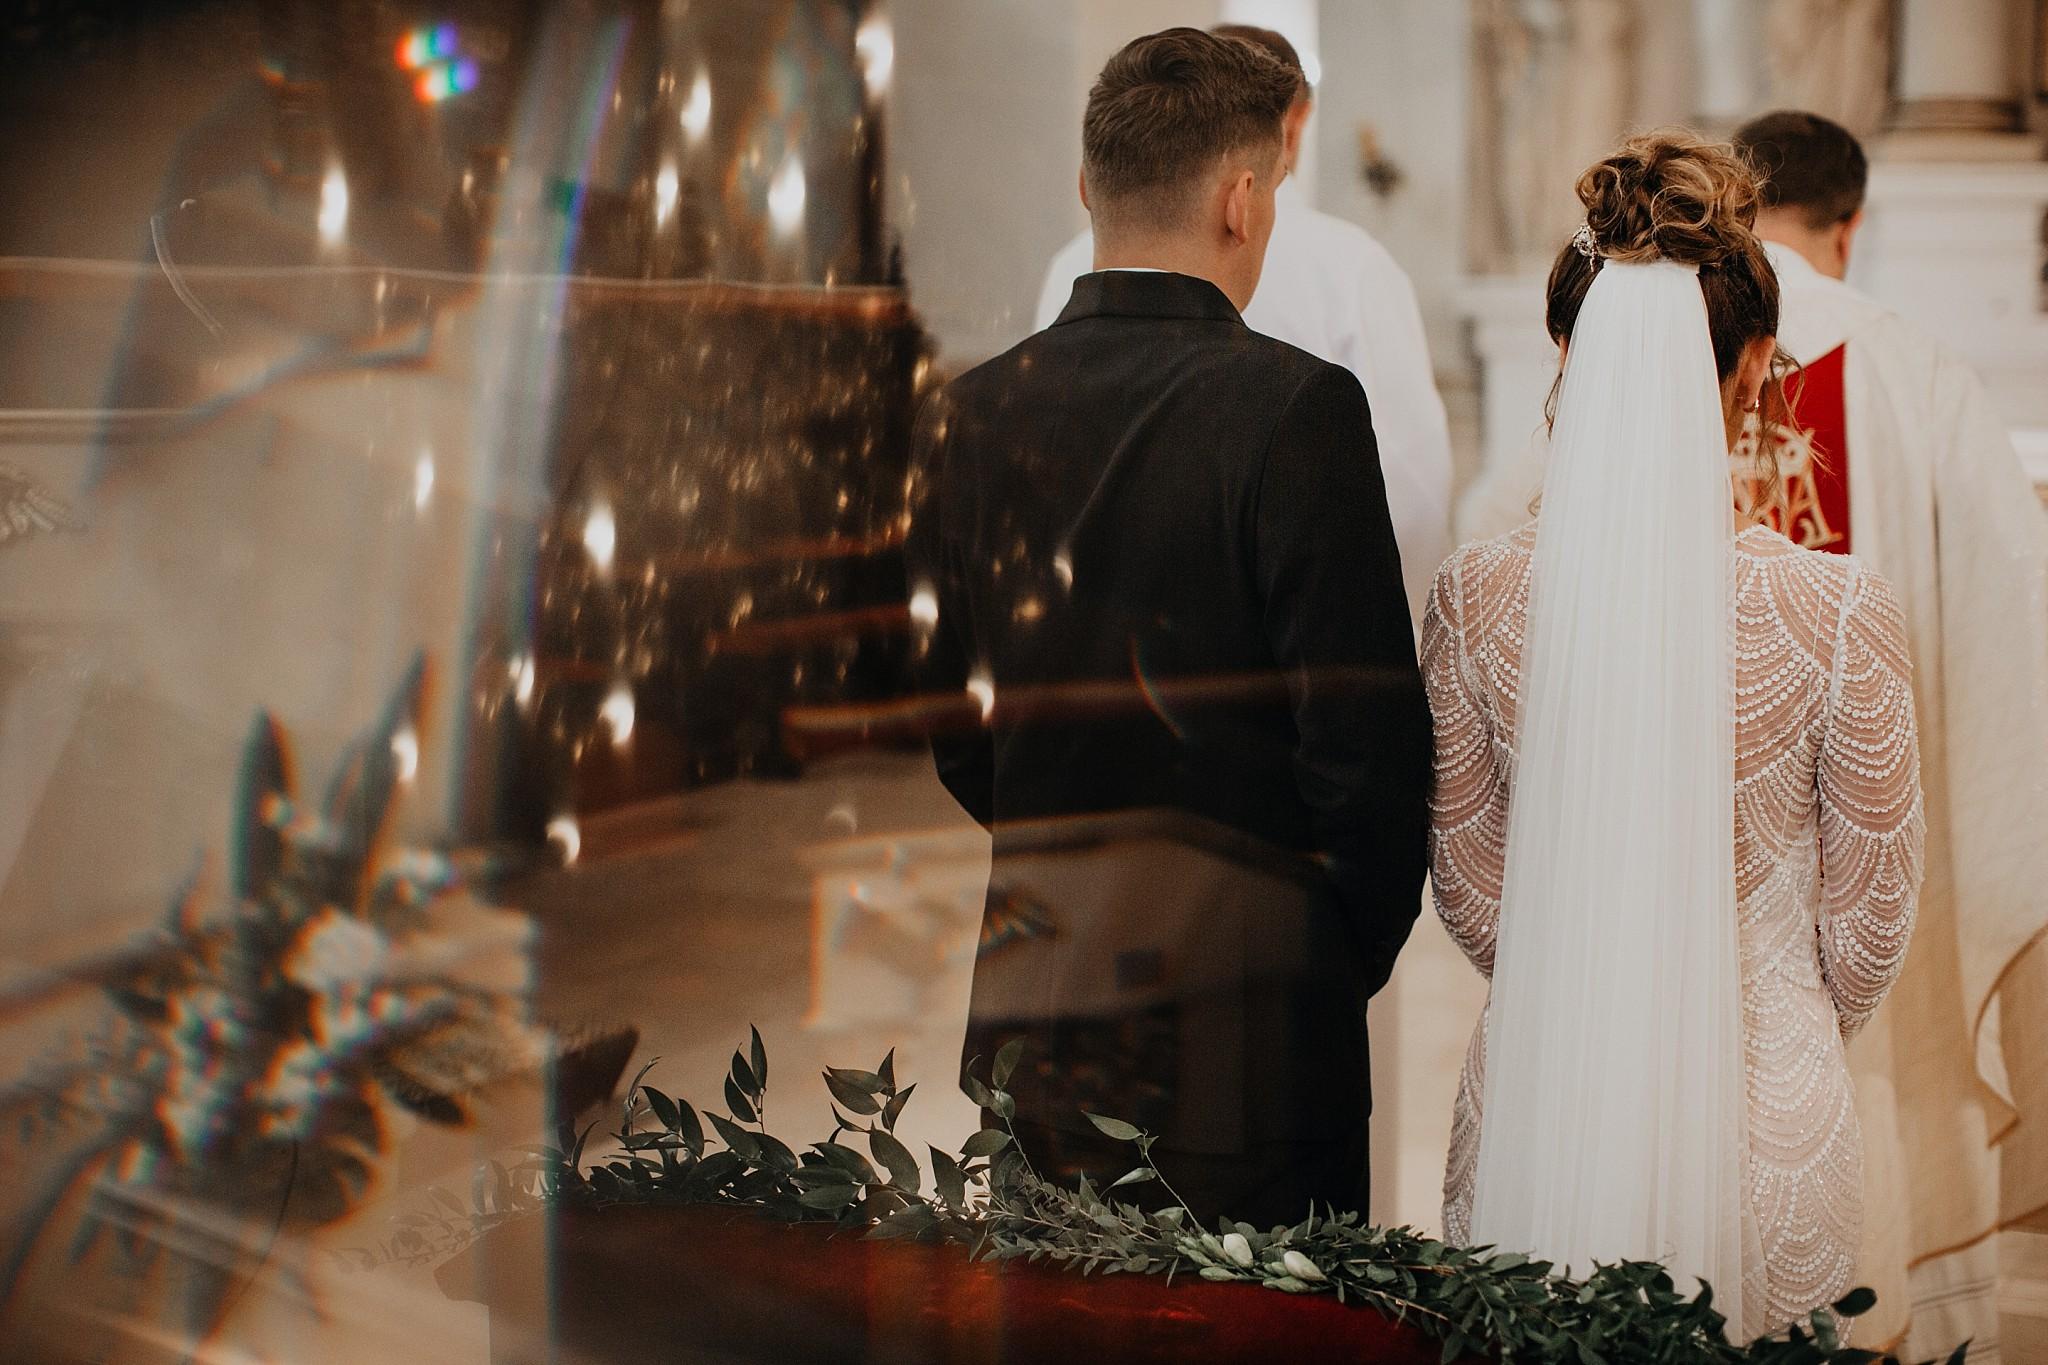 fotograf poznan wesele dobra truskawka piekne wesele pod poznaniem wesele w dobrej truskawce piekna para mloda slub marzen slub koronawirus slub listopad wesele koronawirus 166